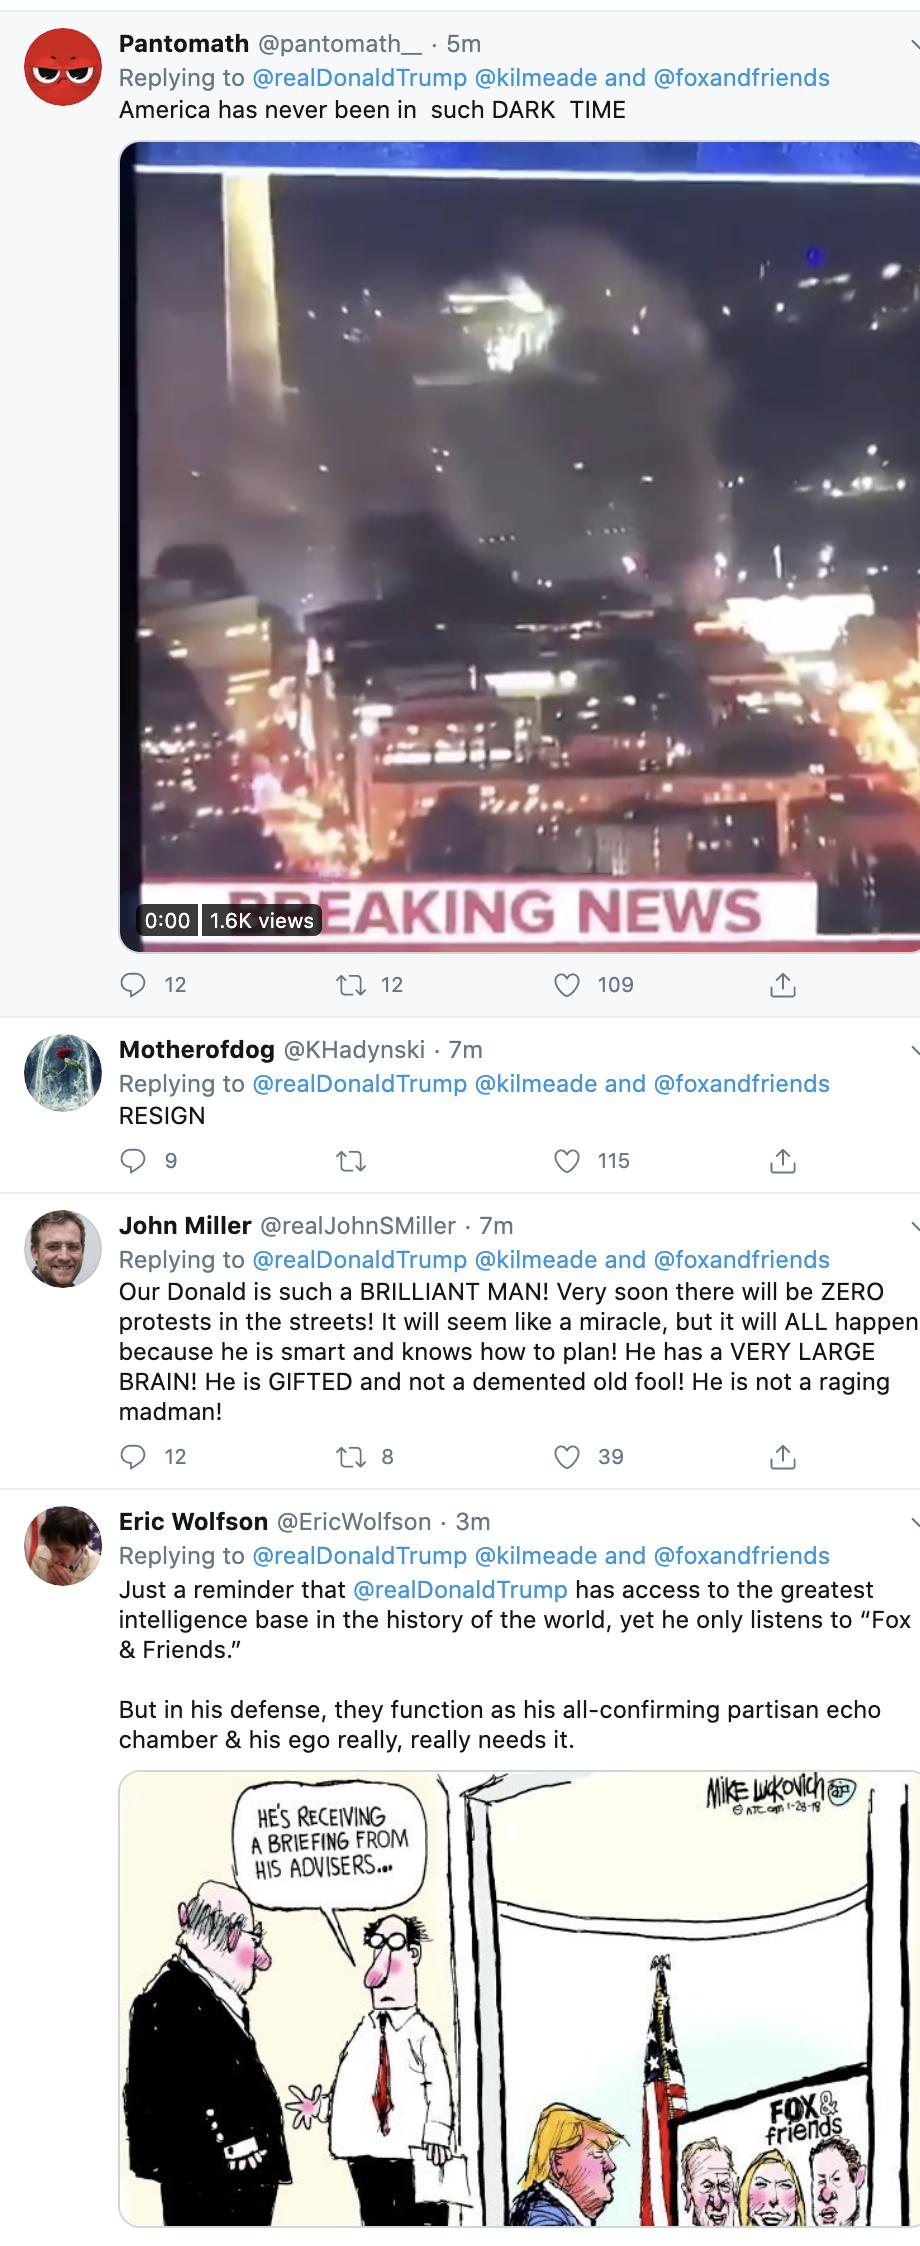 Screen-Shot-2020-06-01-at-7.33.10-AM-1 Trump Suffers Pre-Dawn Emotional Collapse Over 'ANTIFA', Biden, & Seattle Activism Black Lives Matter Featured Politics Top Stories